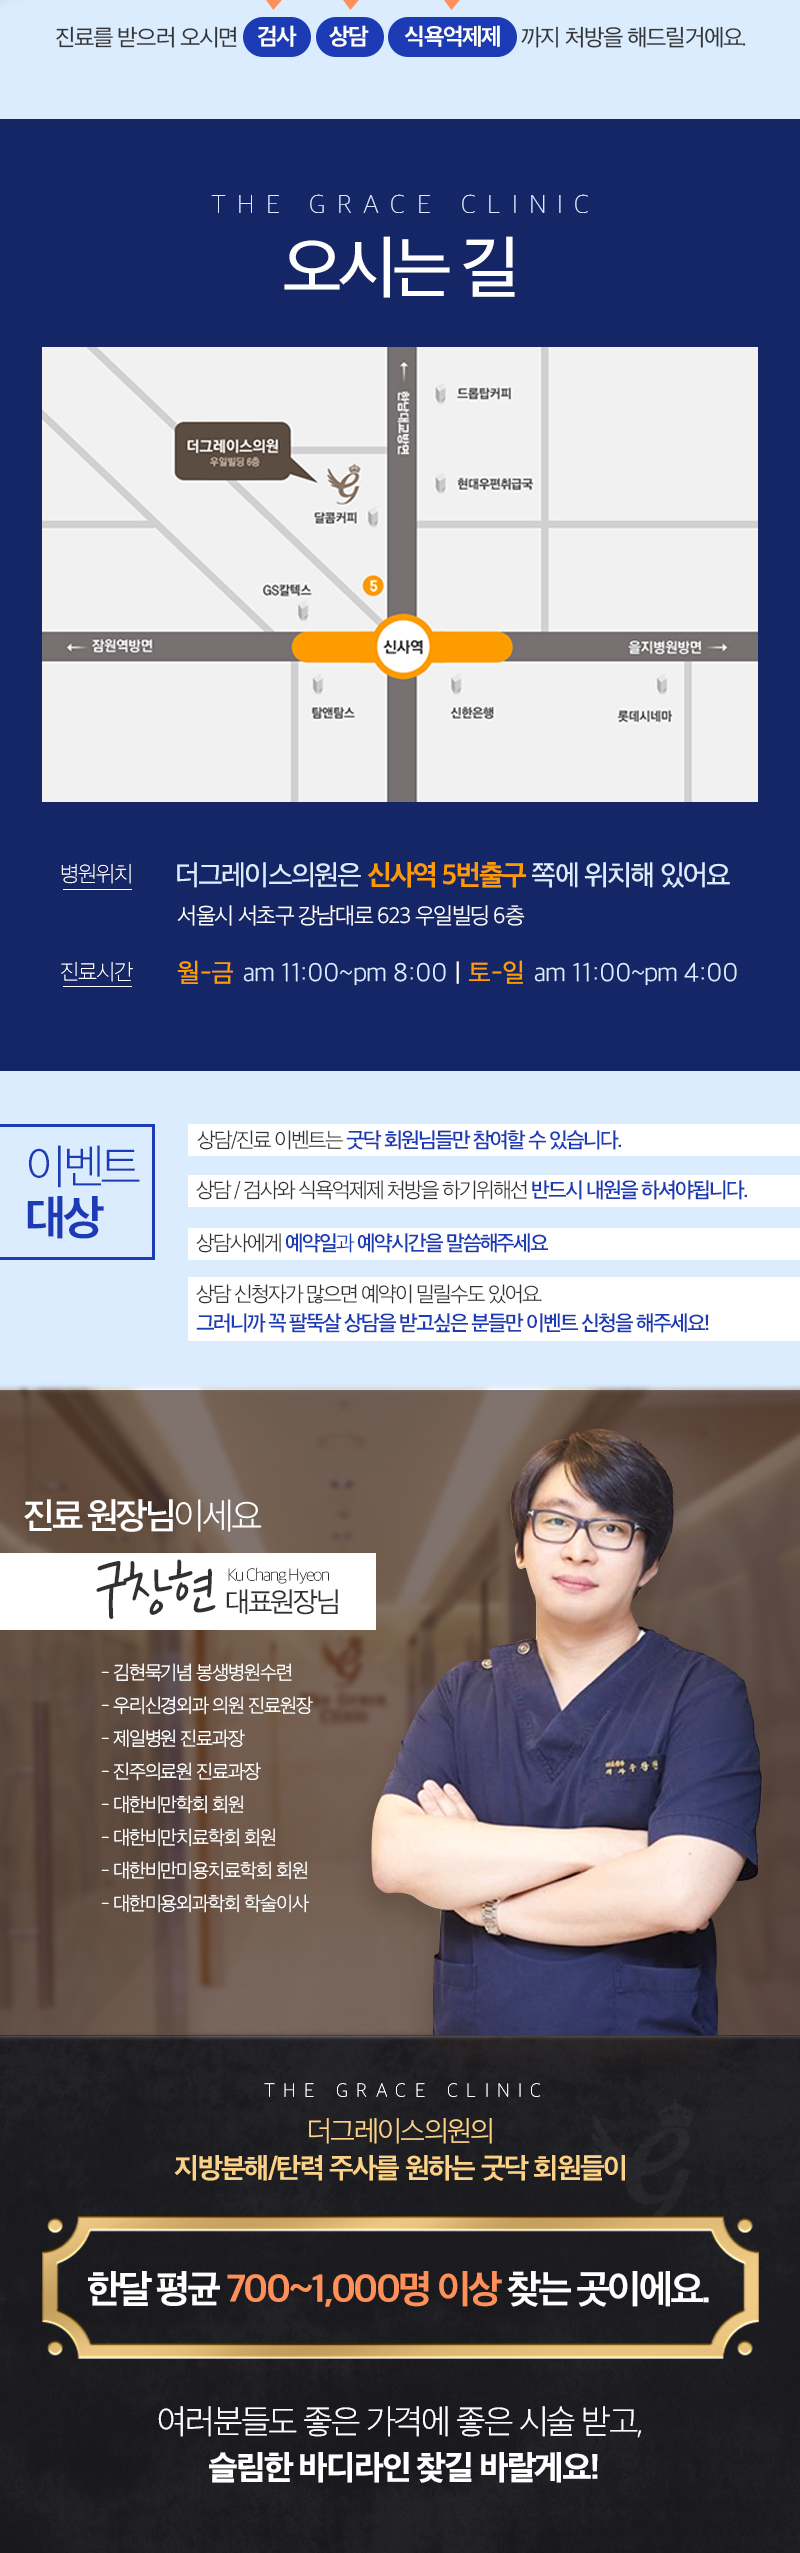 D event info b81c7a09f0015dc65b